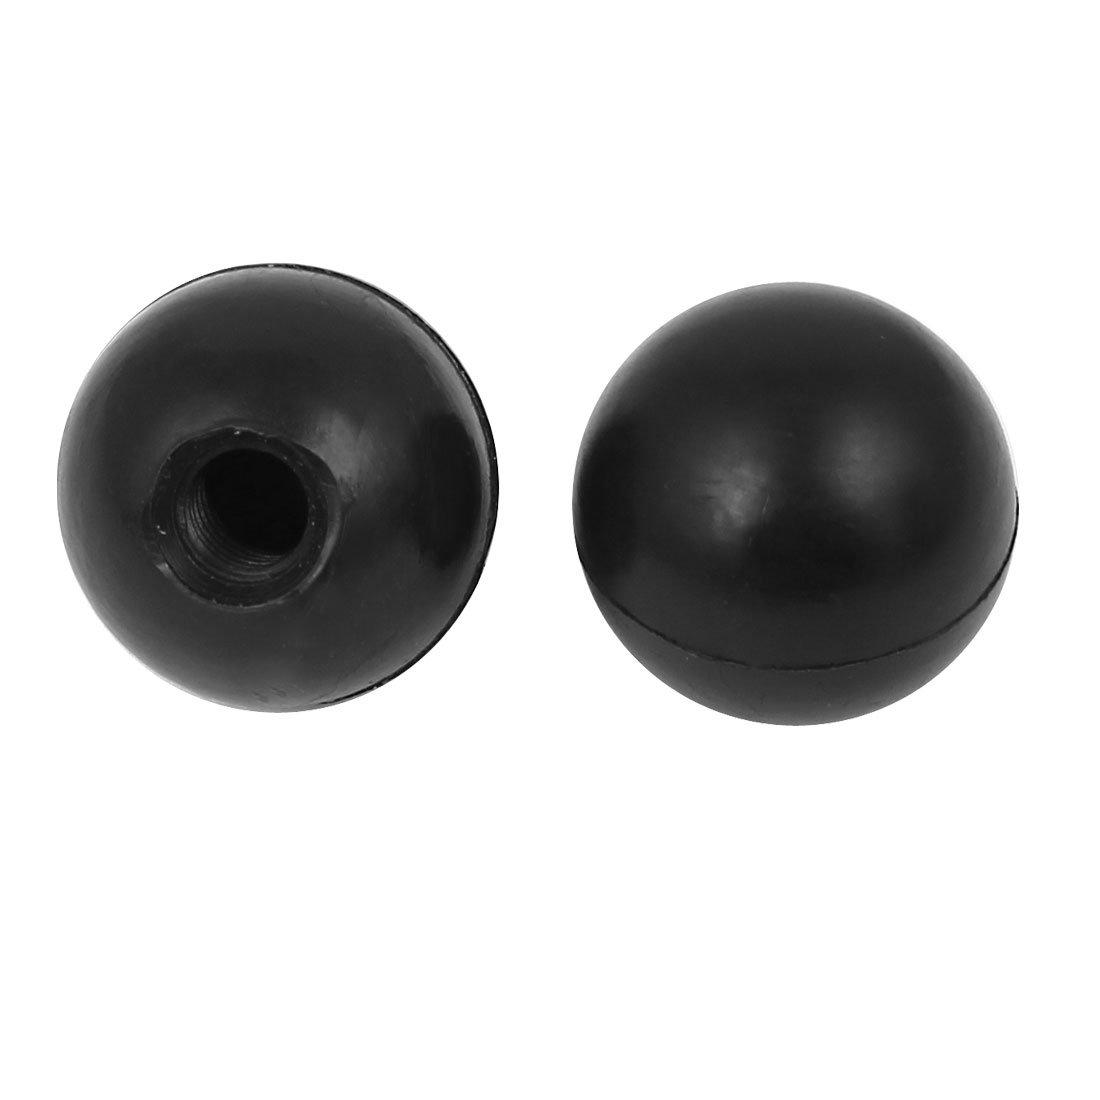 Sourcingmap/® 2Pcs Plastic Shell M8x25mm Round Ball Lever Knob Machine Control Grip